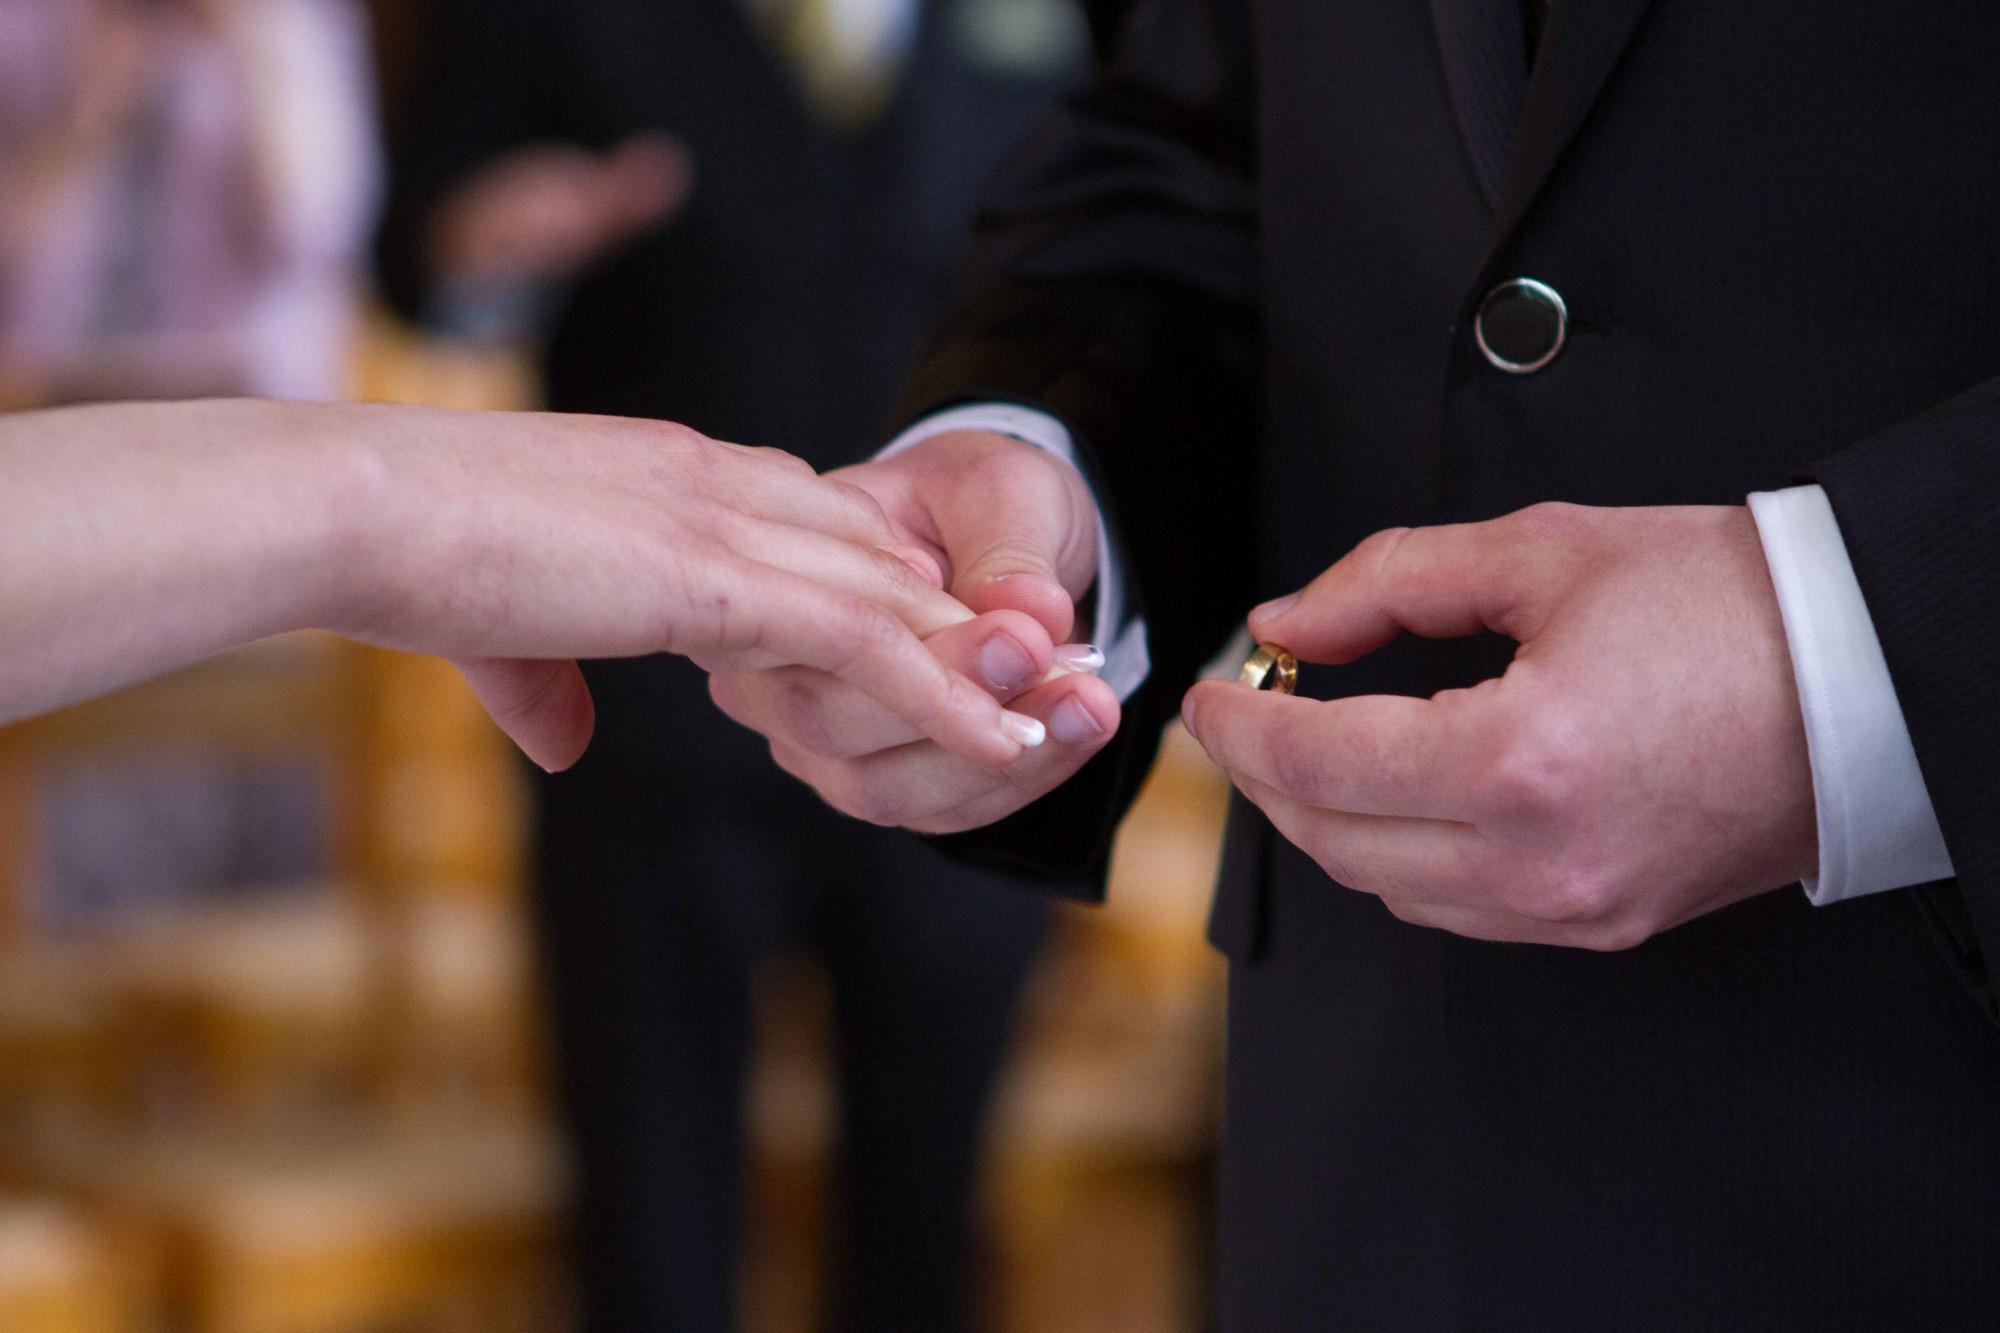 Hochzeitsfotografie - Ring an Finger